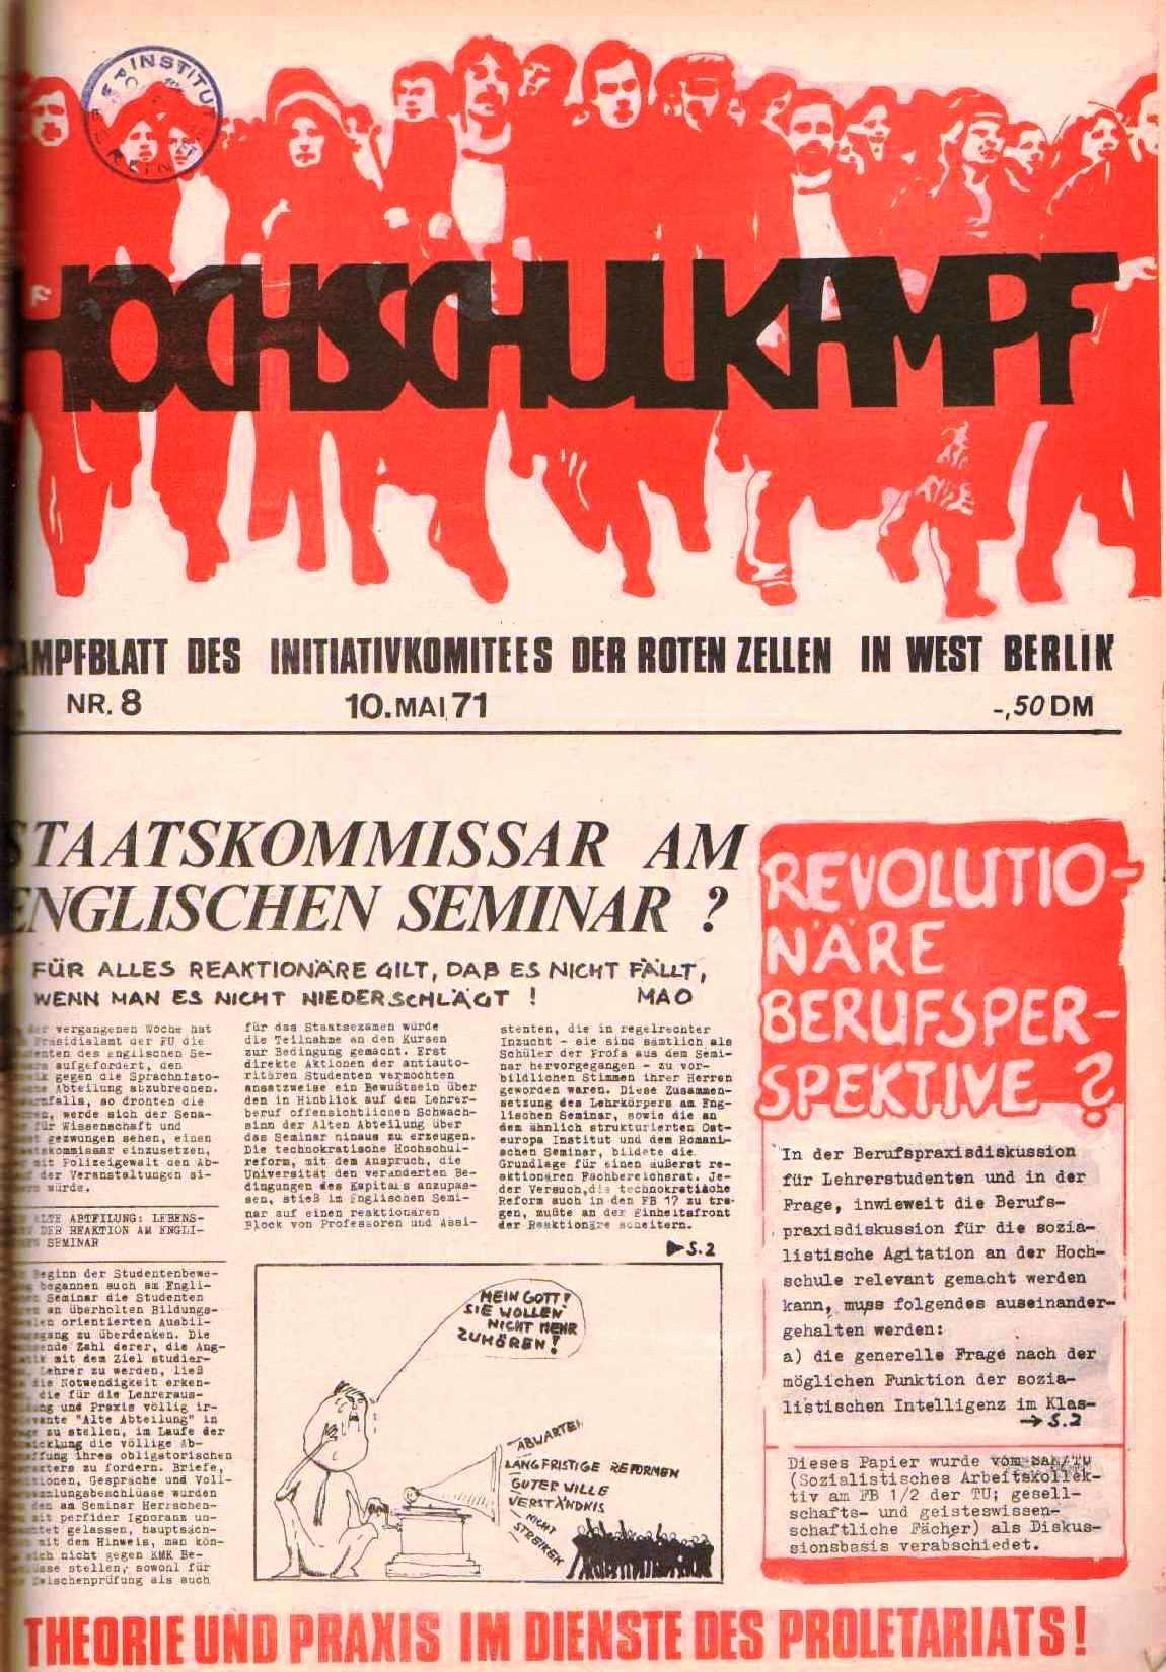 Berlin_Hochschulkampf_1971_08_01